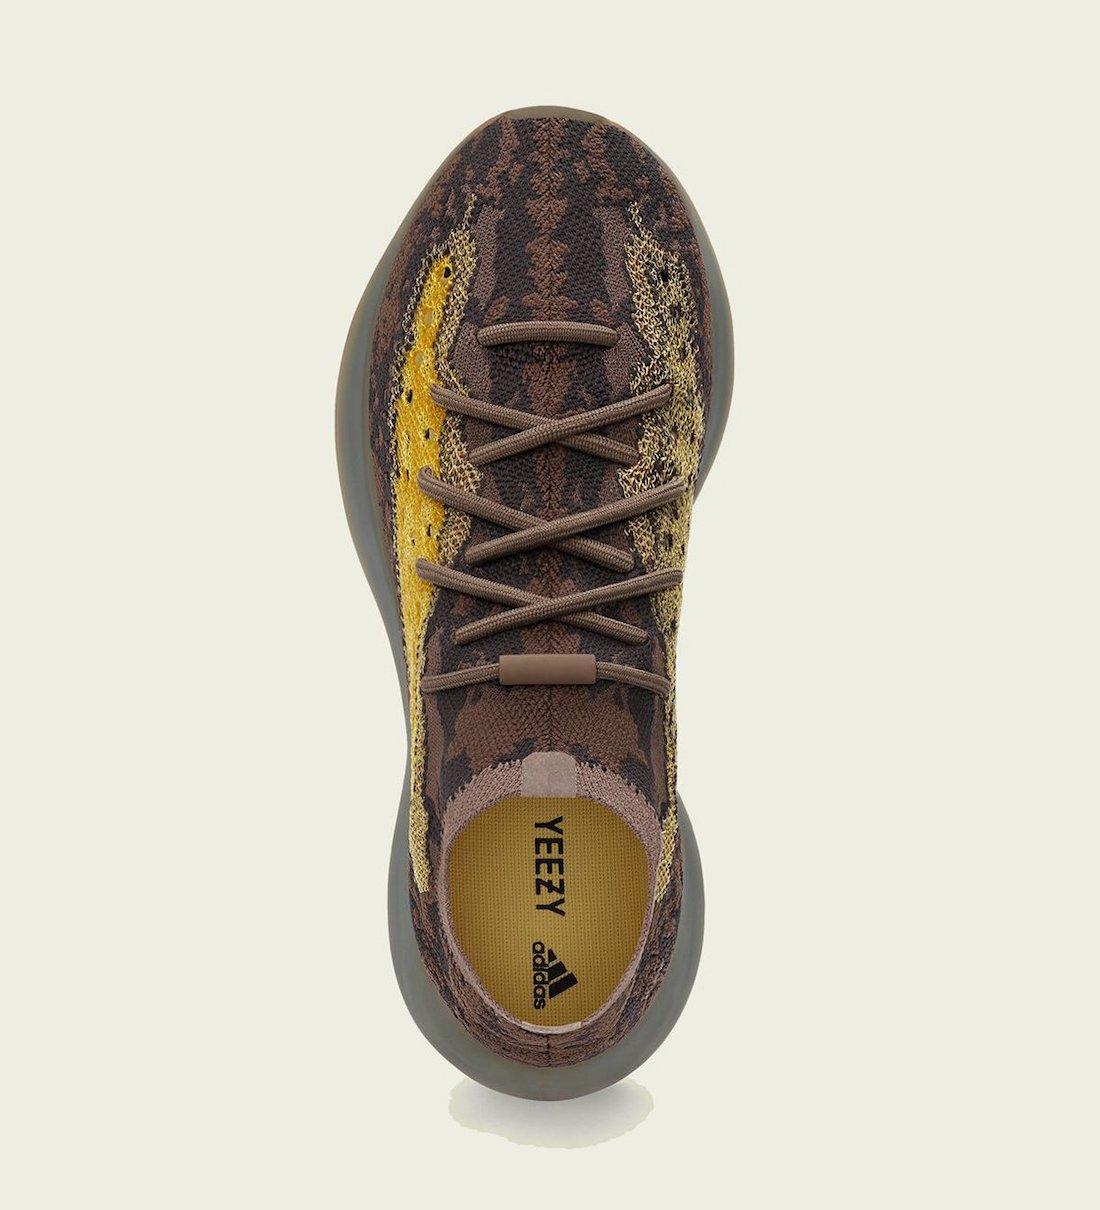 adidas Yeezy Boost 380 ''LMNTE'' - FZ4982